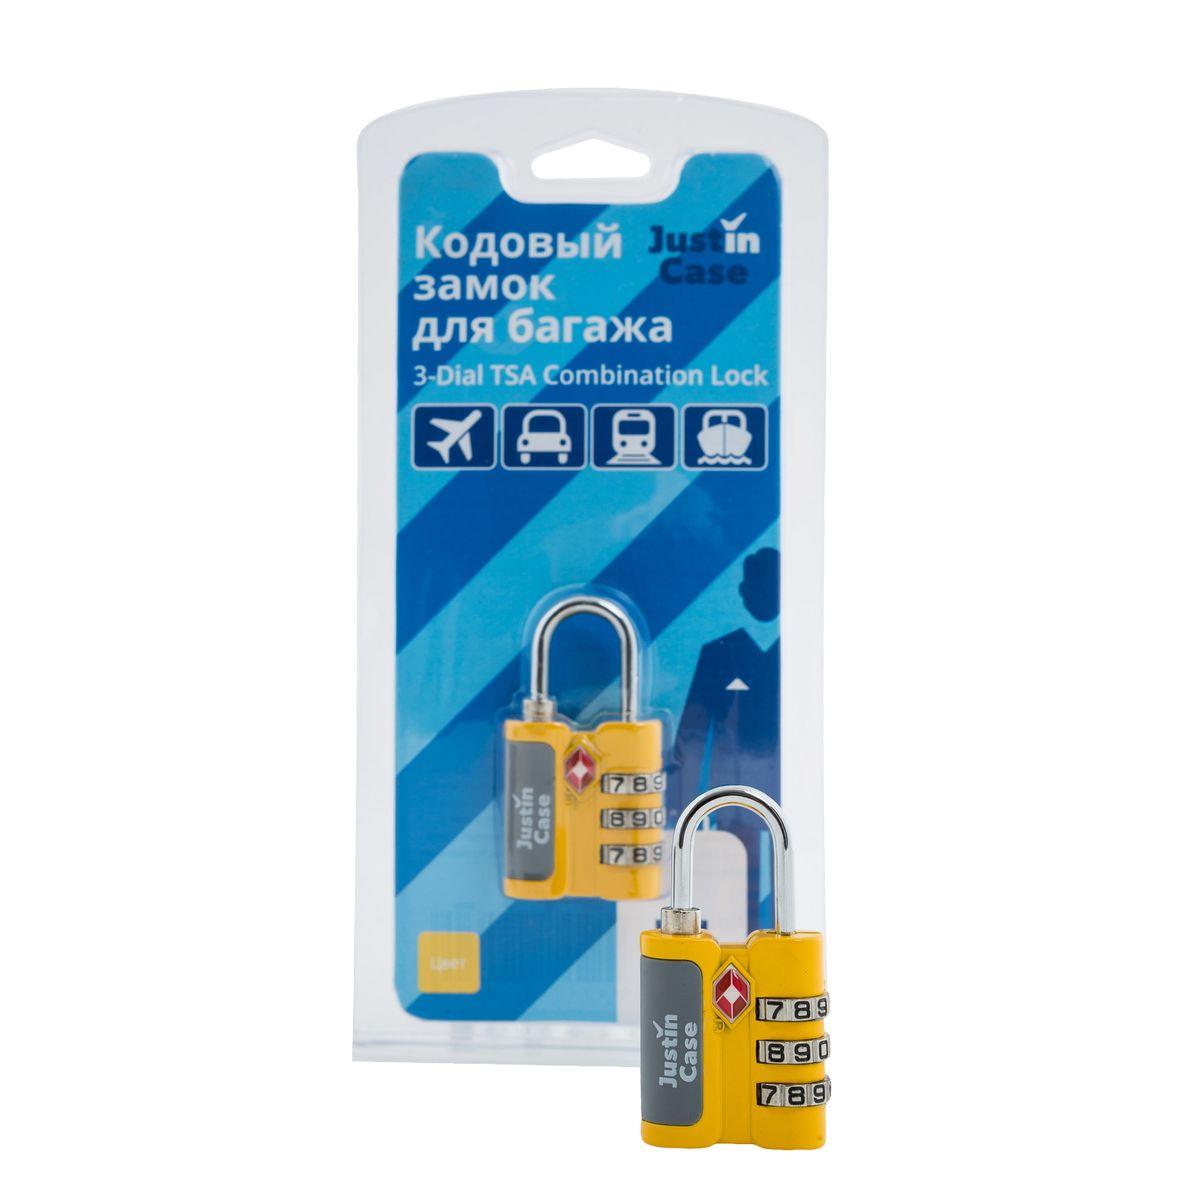 цена на Замок для багажа JustinCase 3-Dial TSA Combination Lock, цвет: желтый